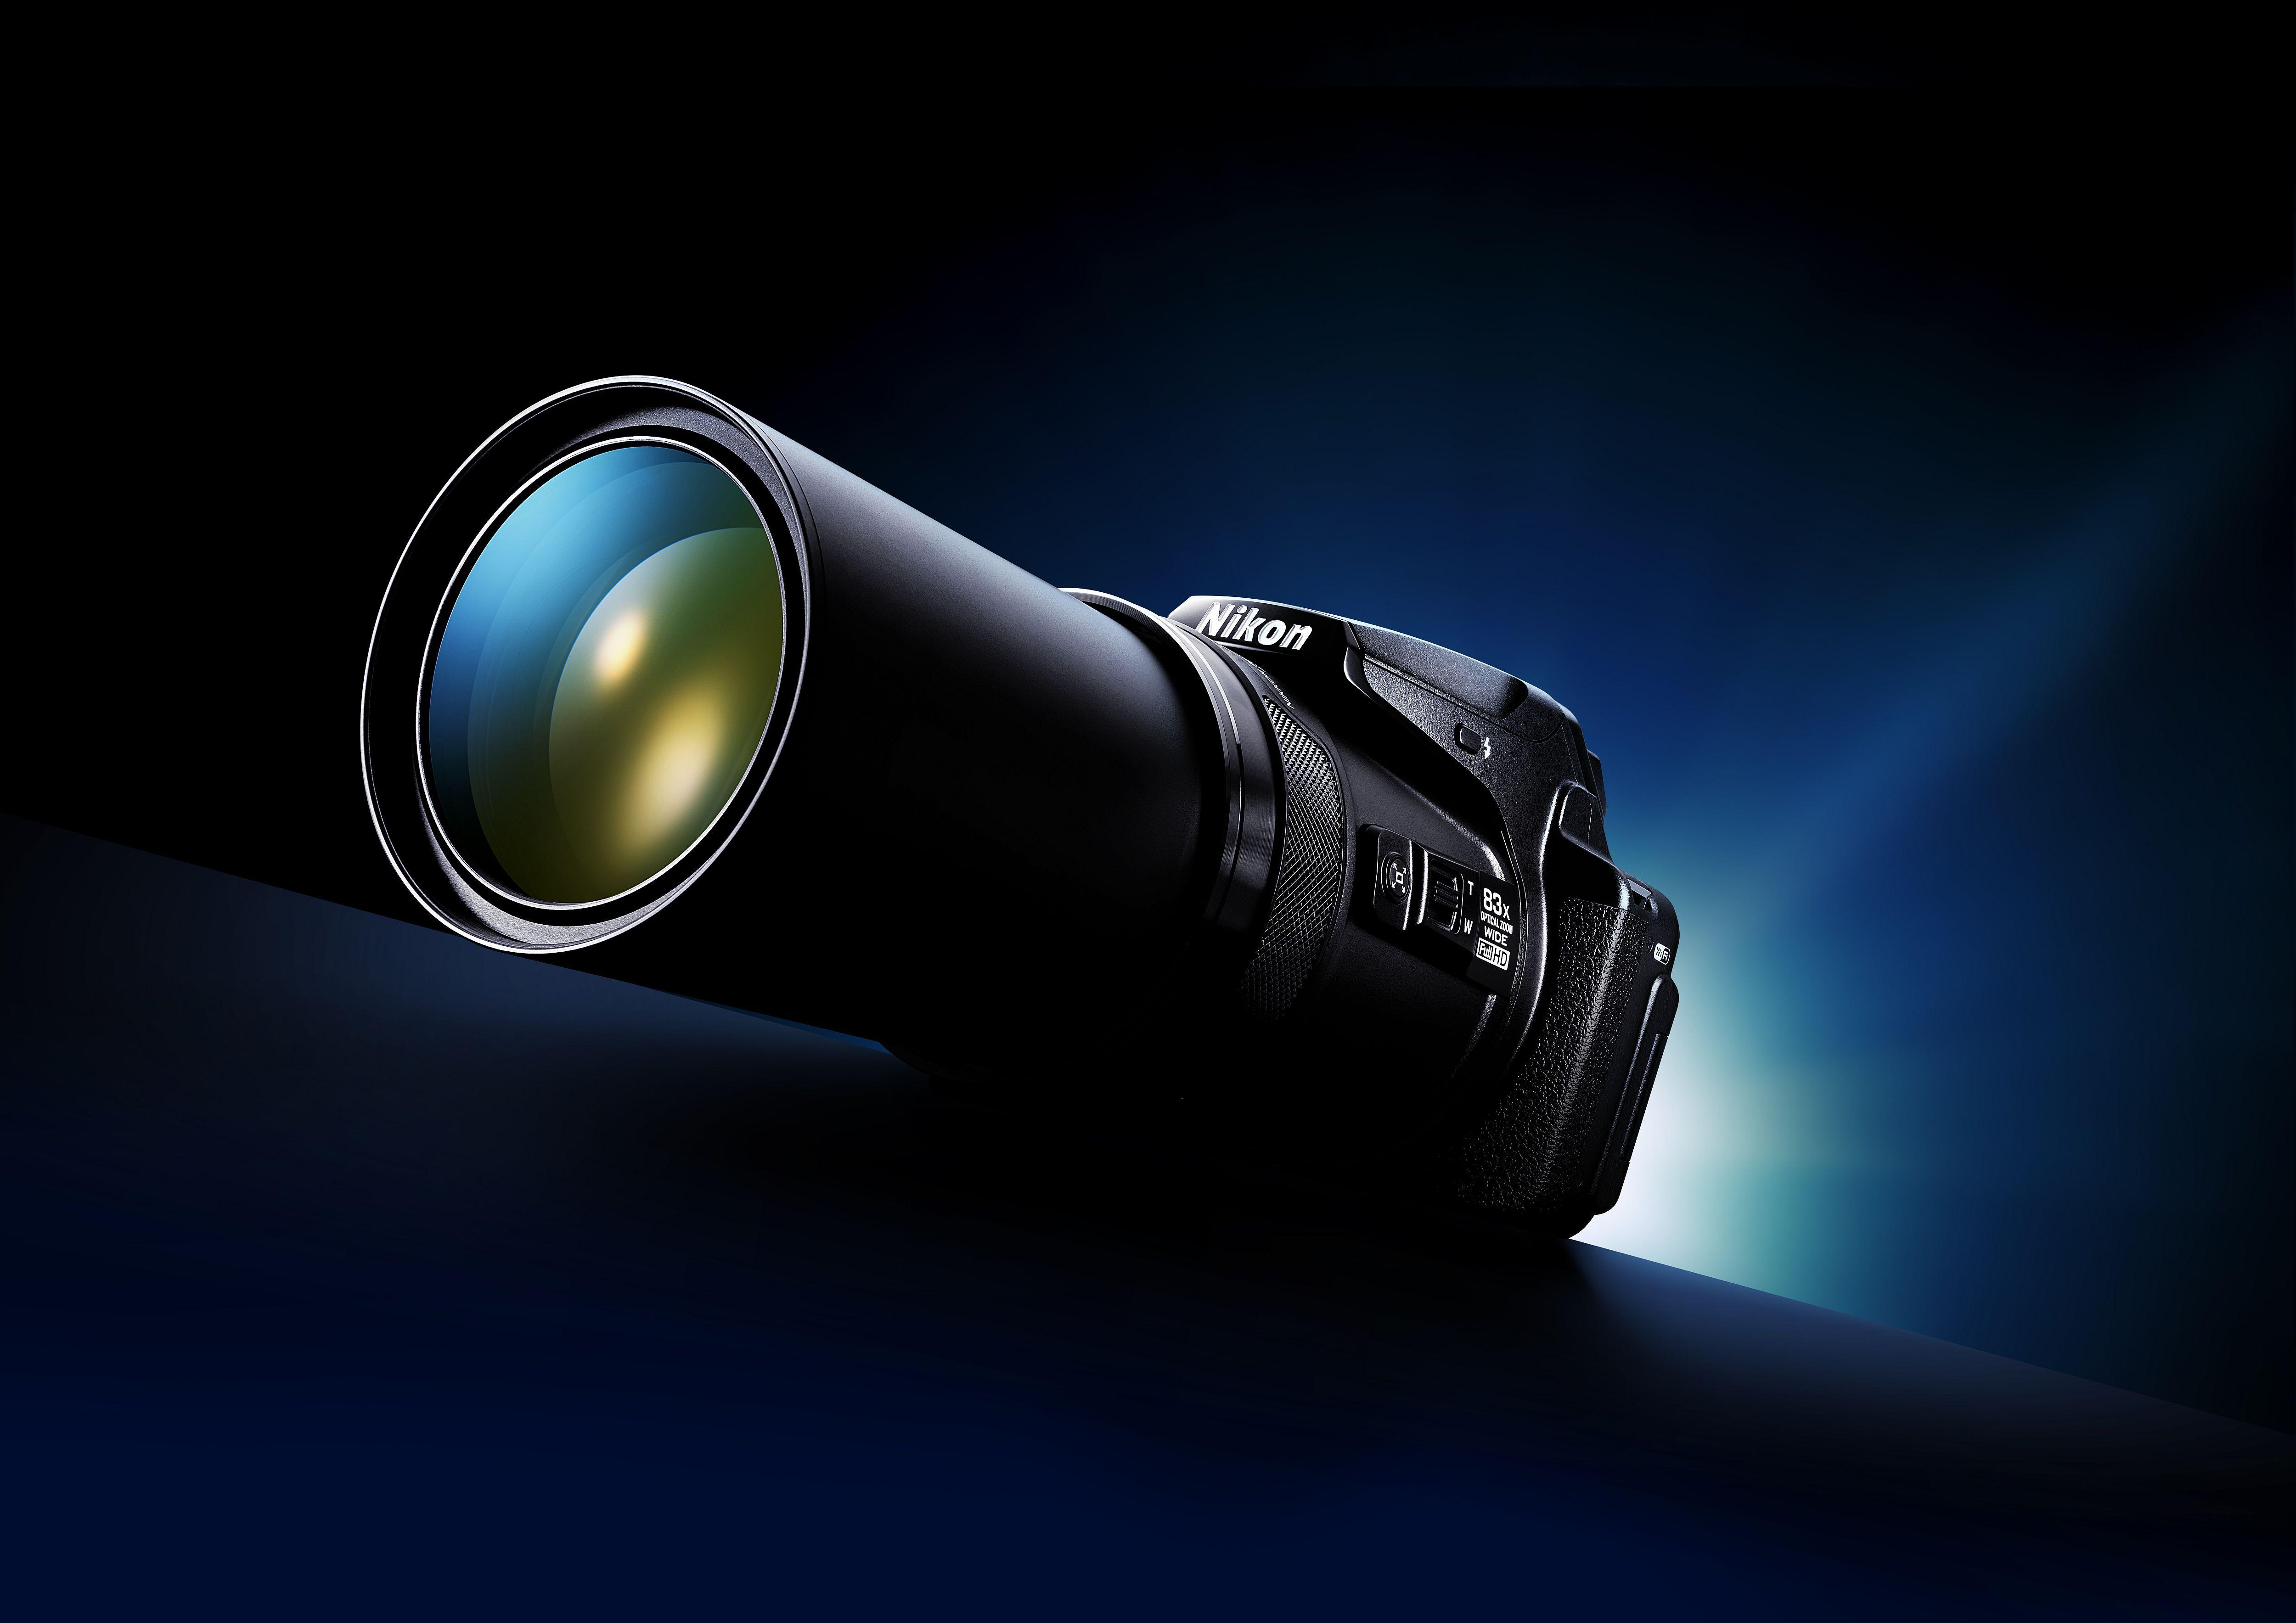 Nikon_Coolpix_P900